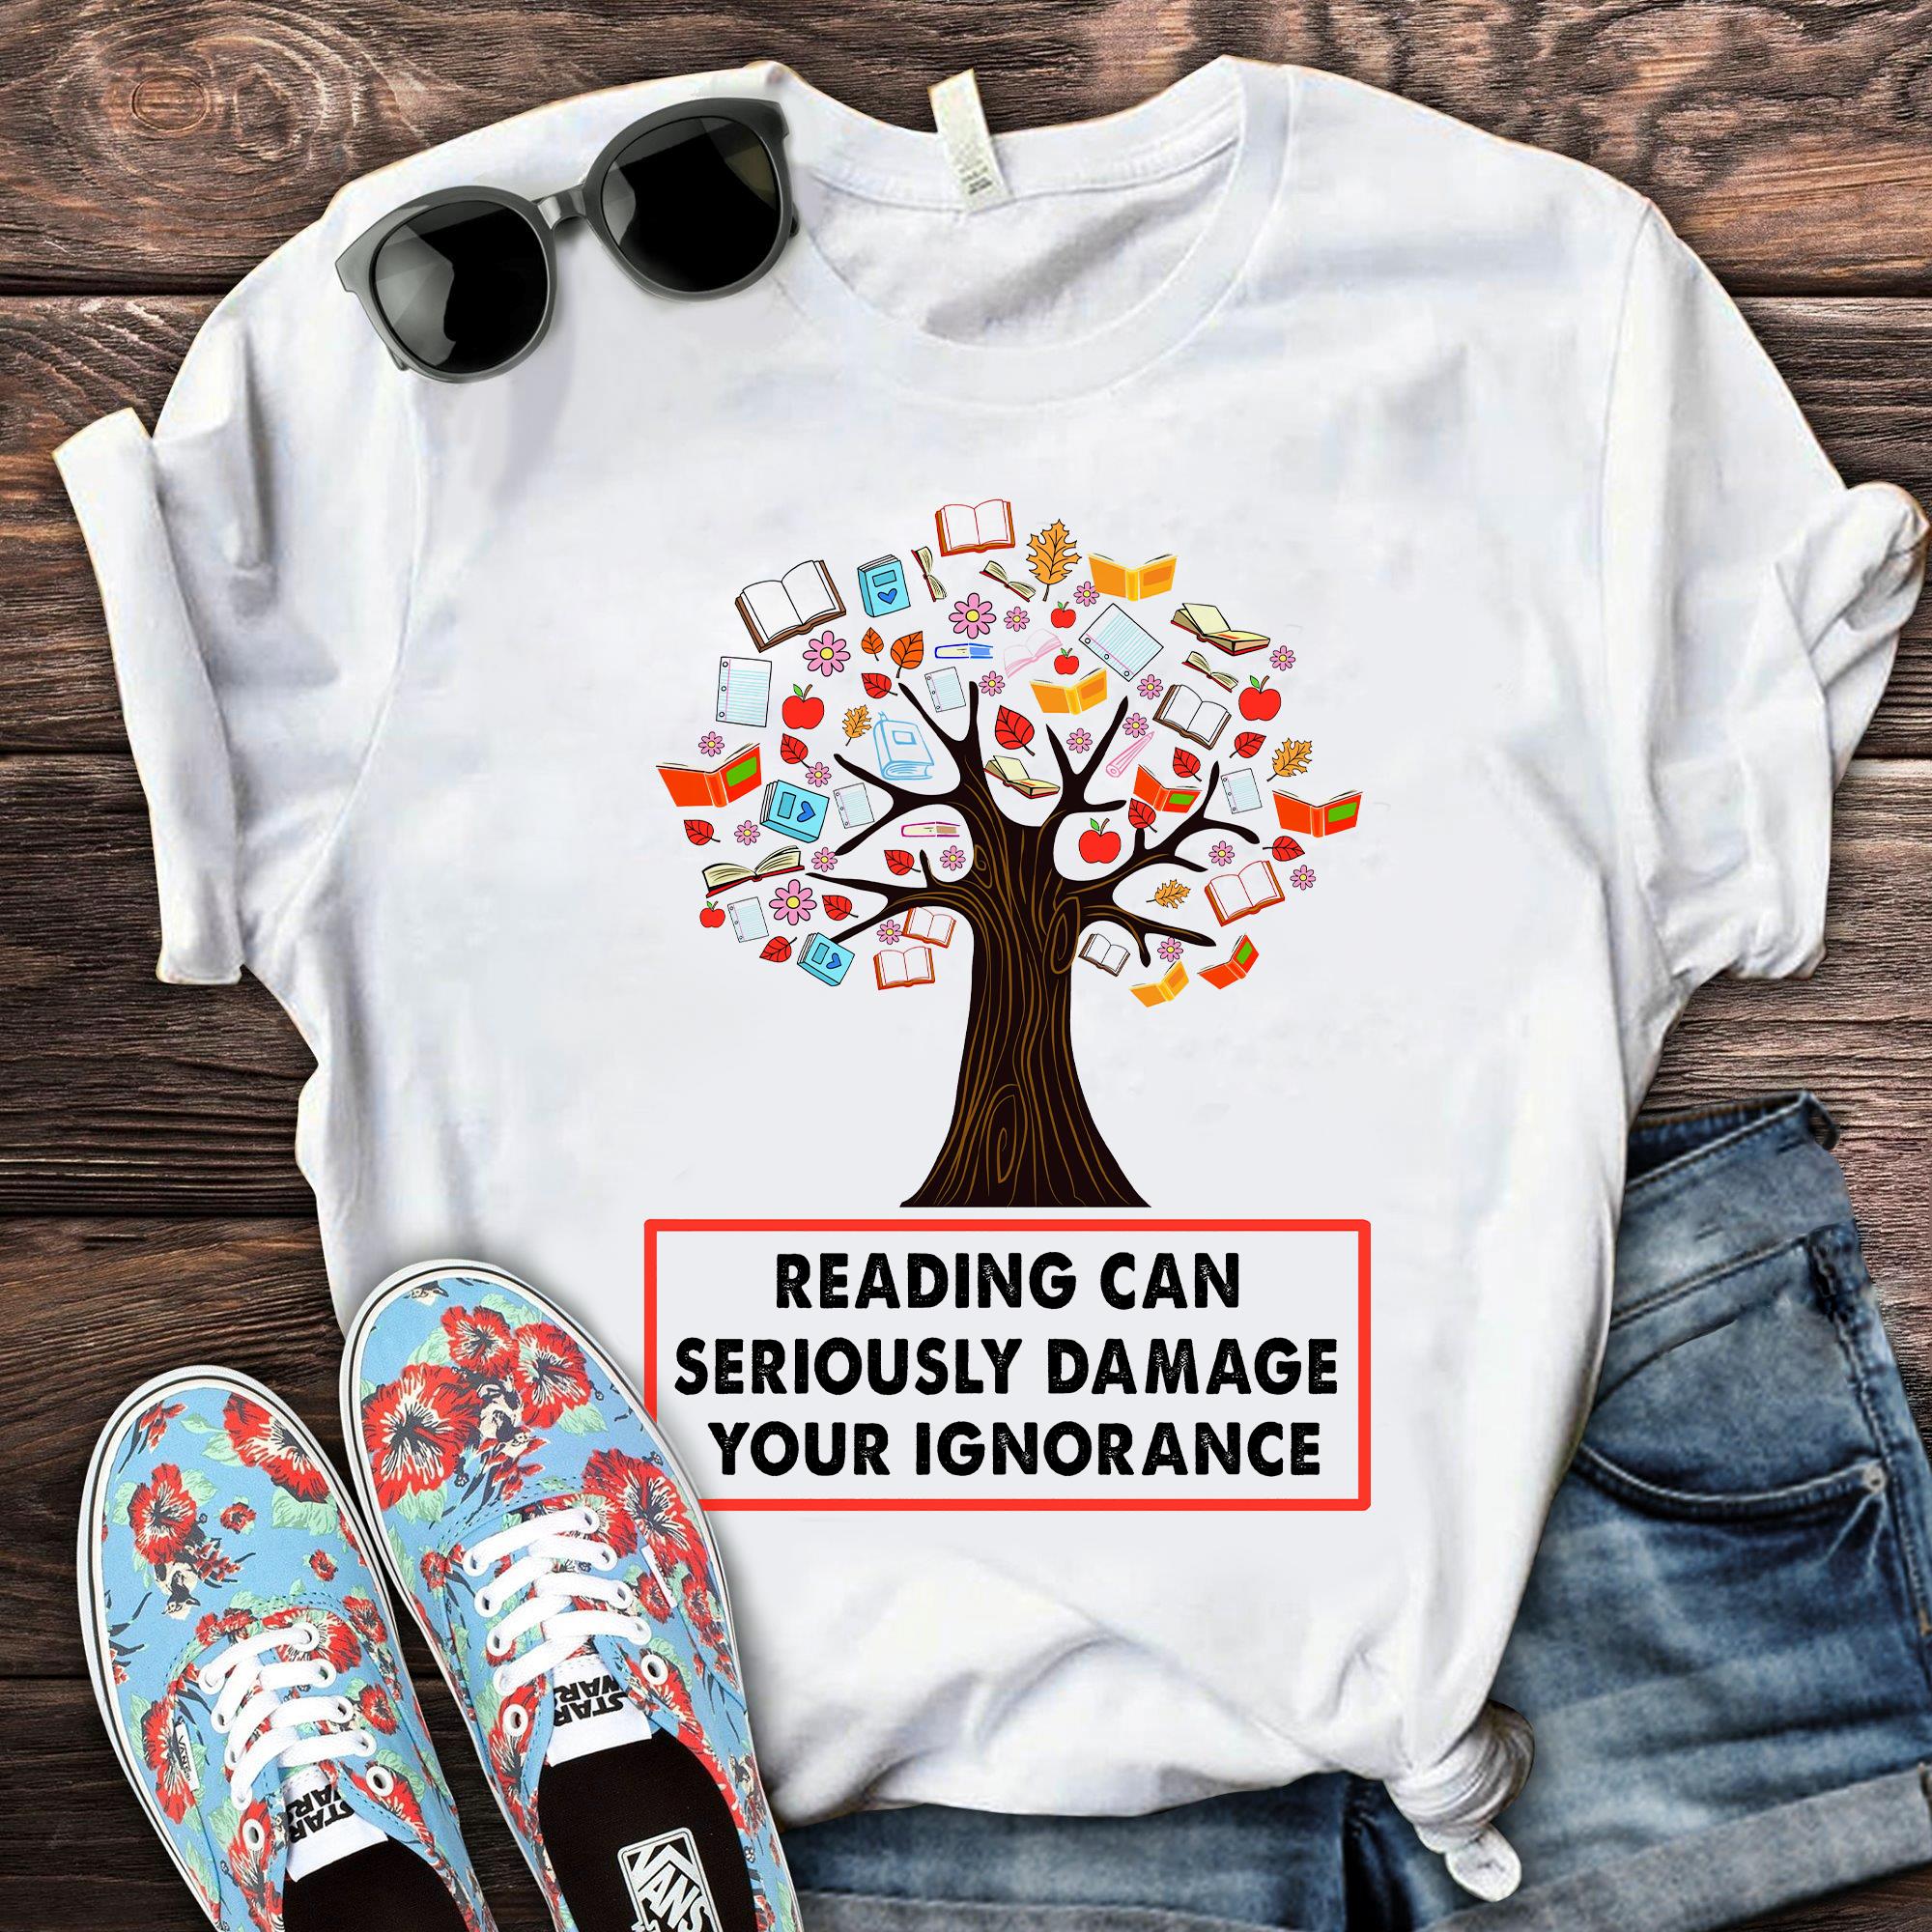 Reading Shirt Reading Can Seriously Damage Ignorance